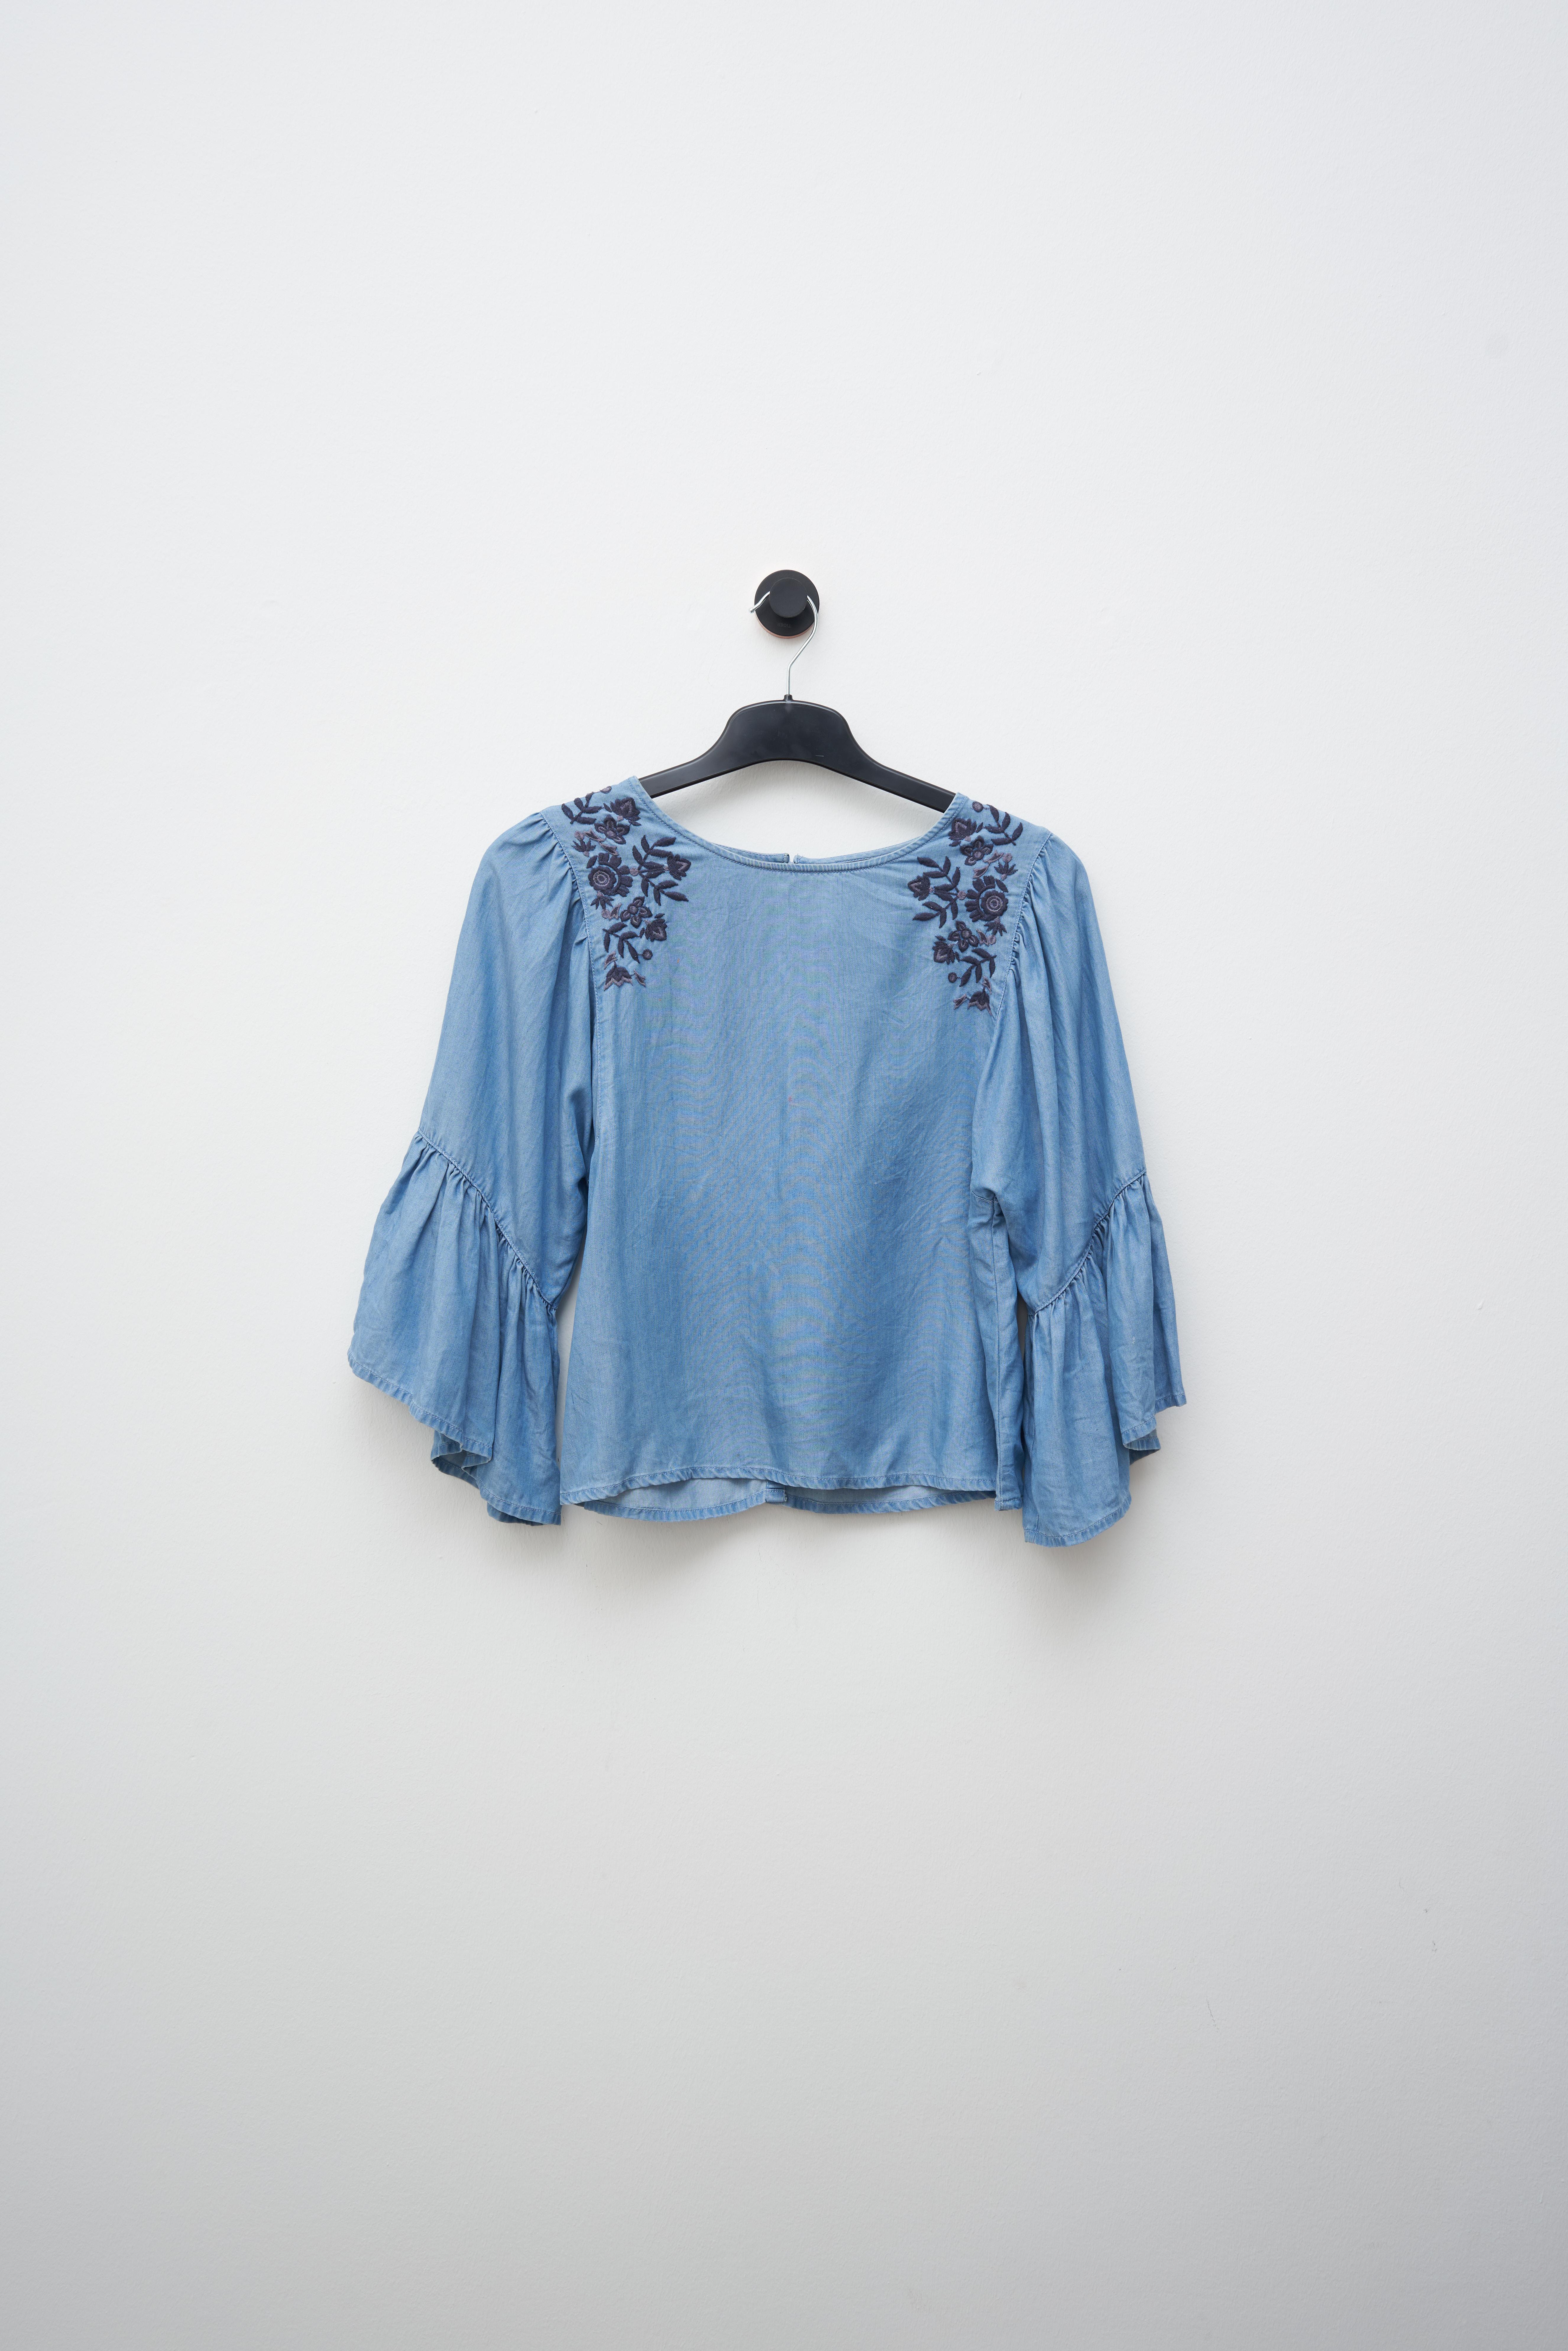 Hollister Co. Bluse Blau Gr.M